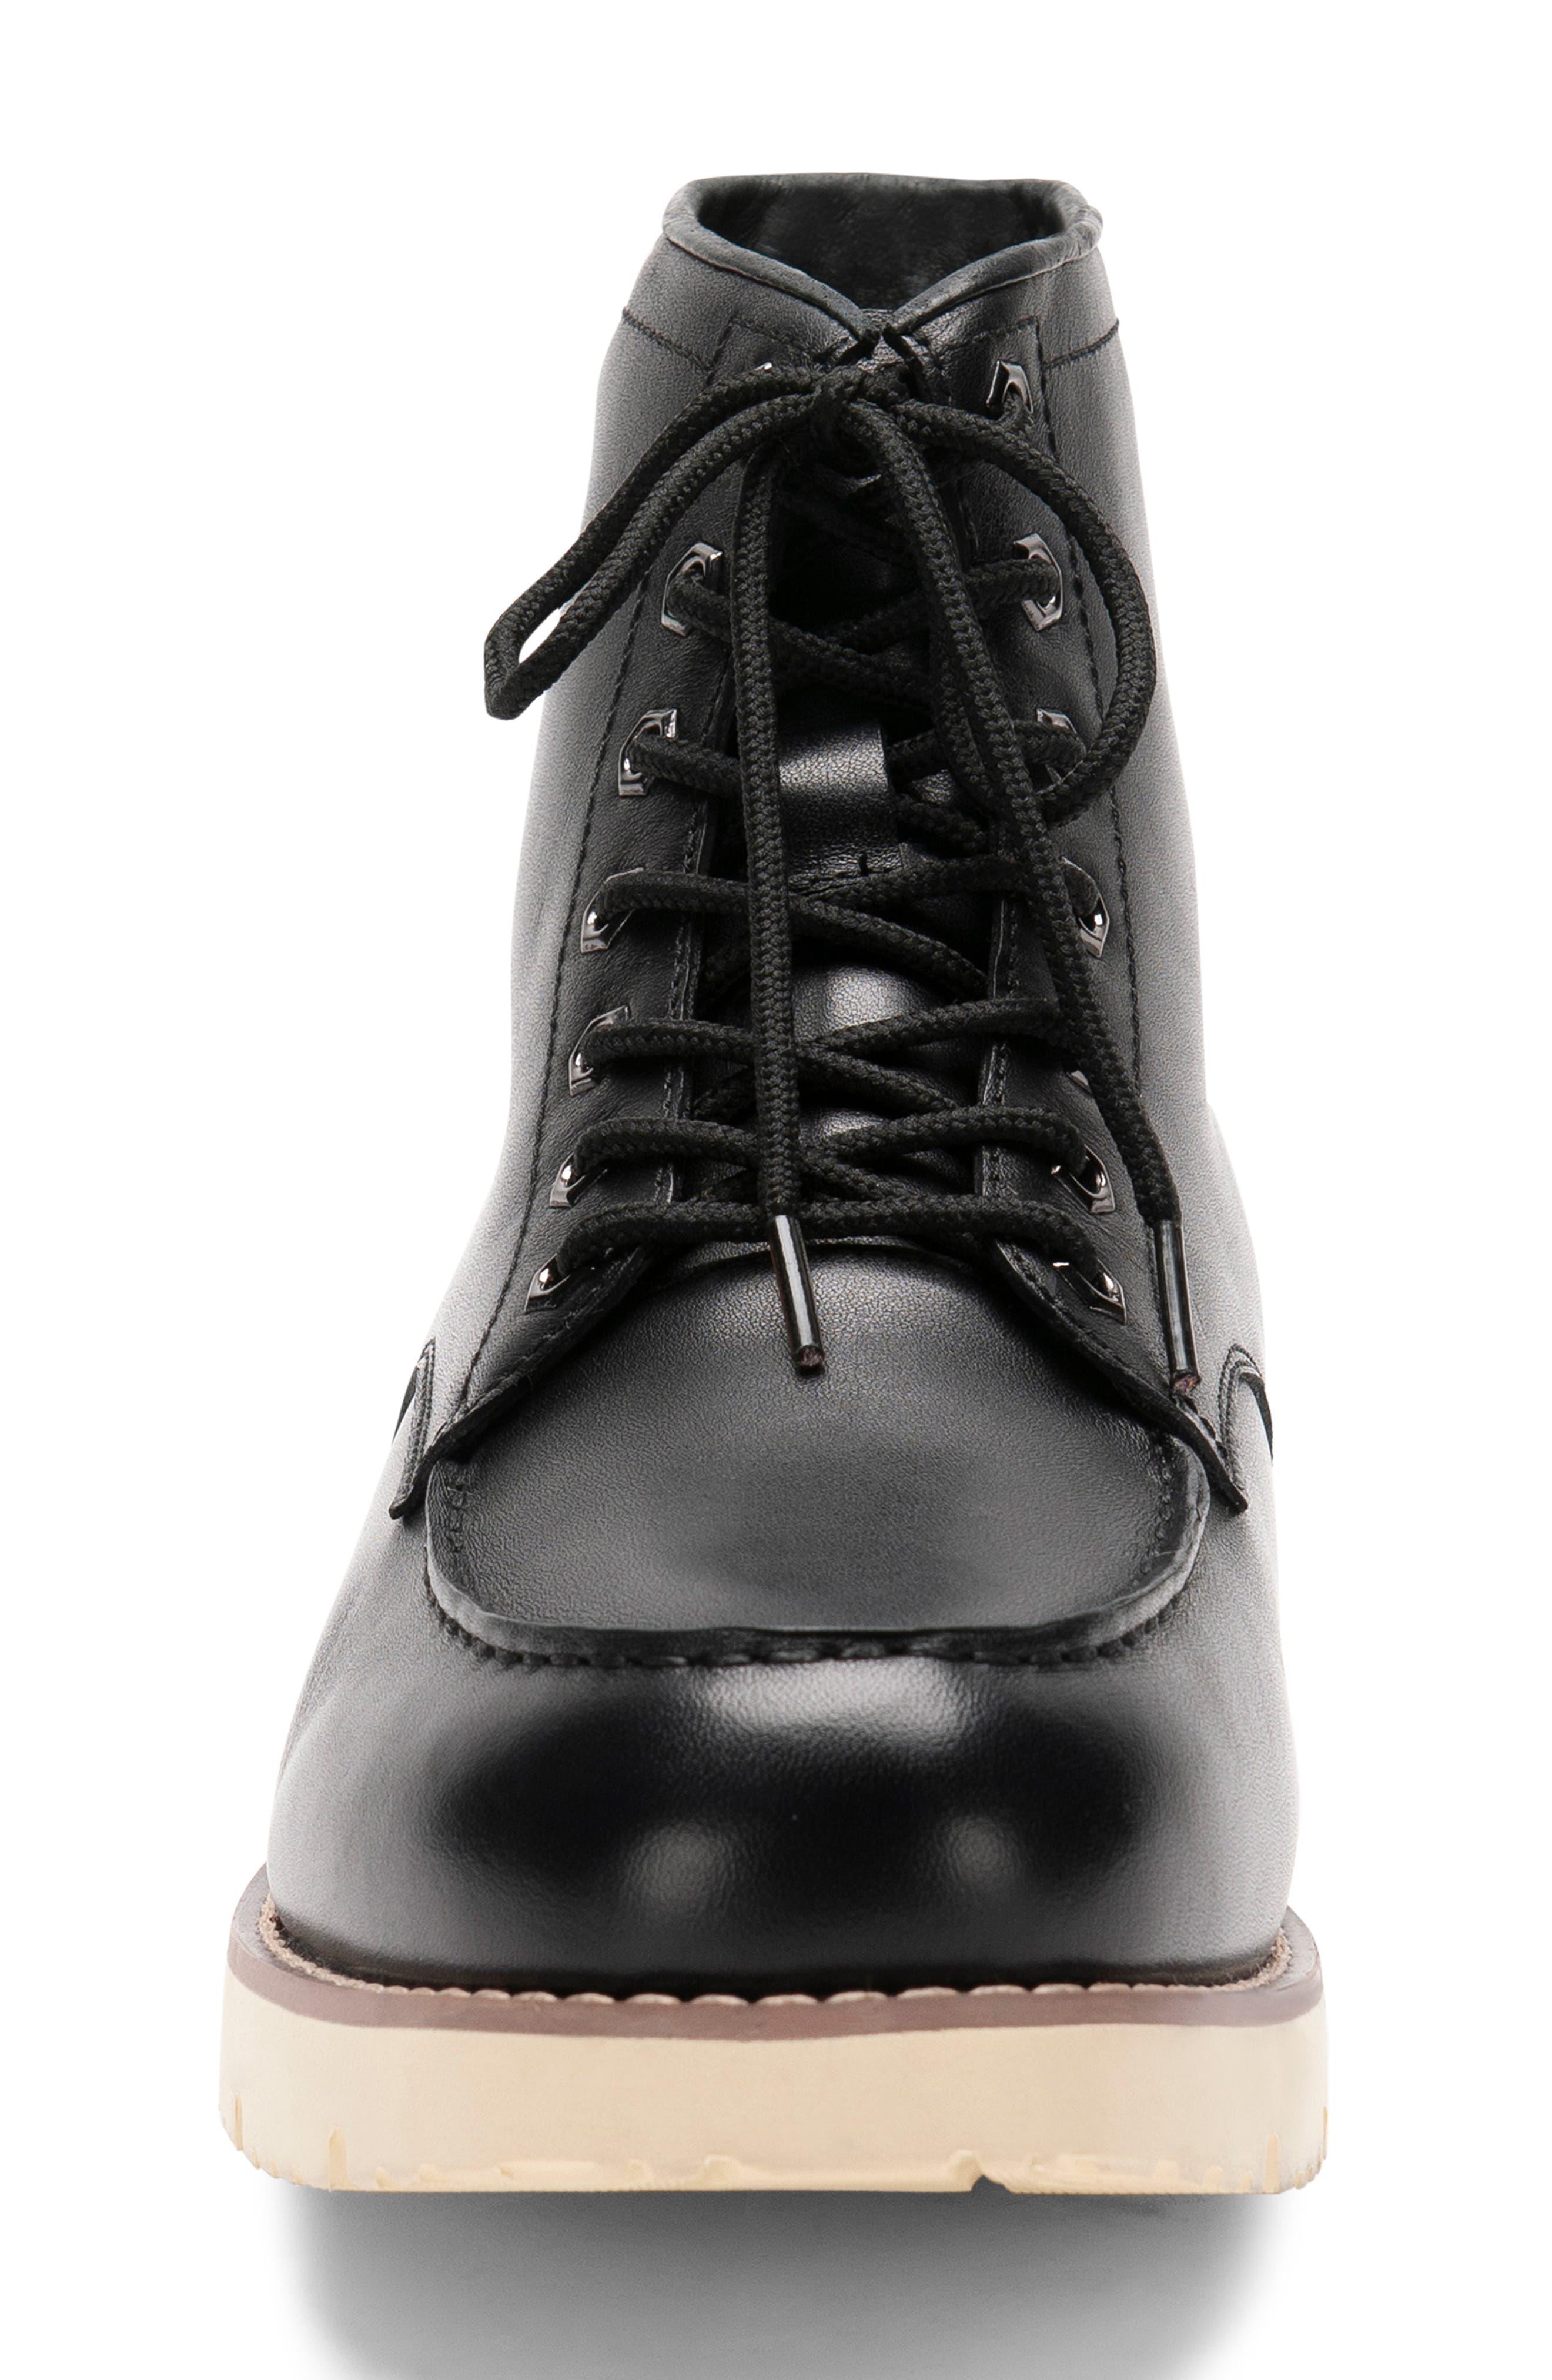 BLONDO, Mario Waterproof Moc Toe Boot, Alternate thumbnail 4, color, BLACK LEATHER